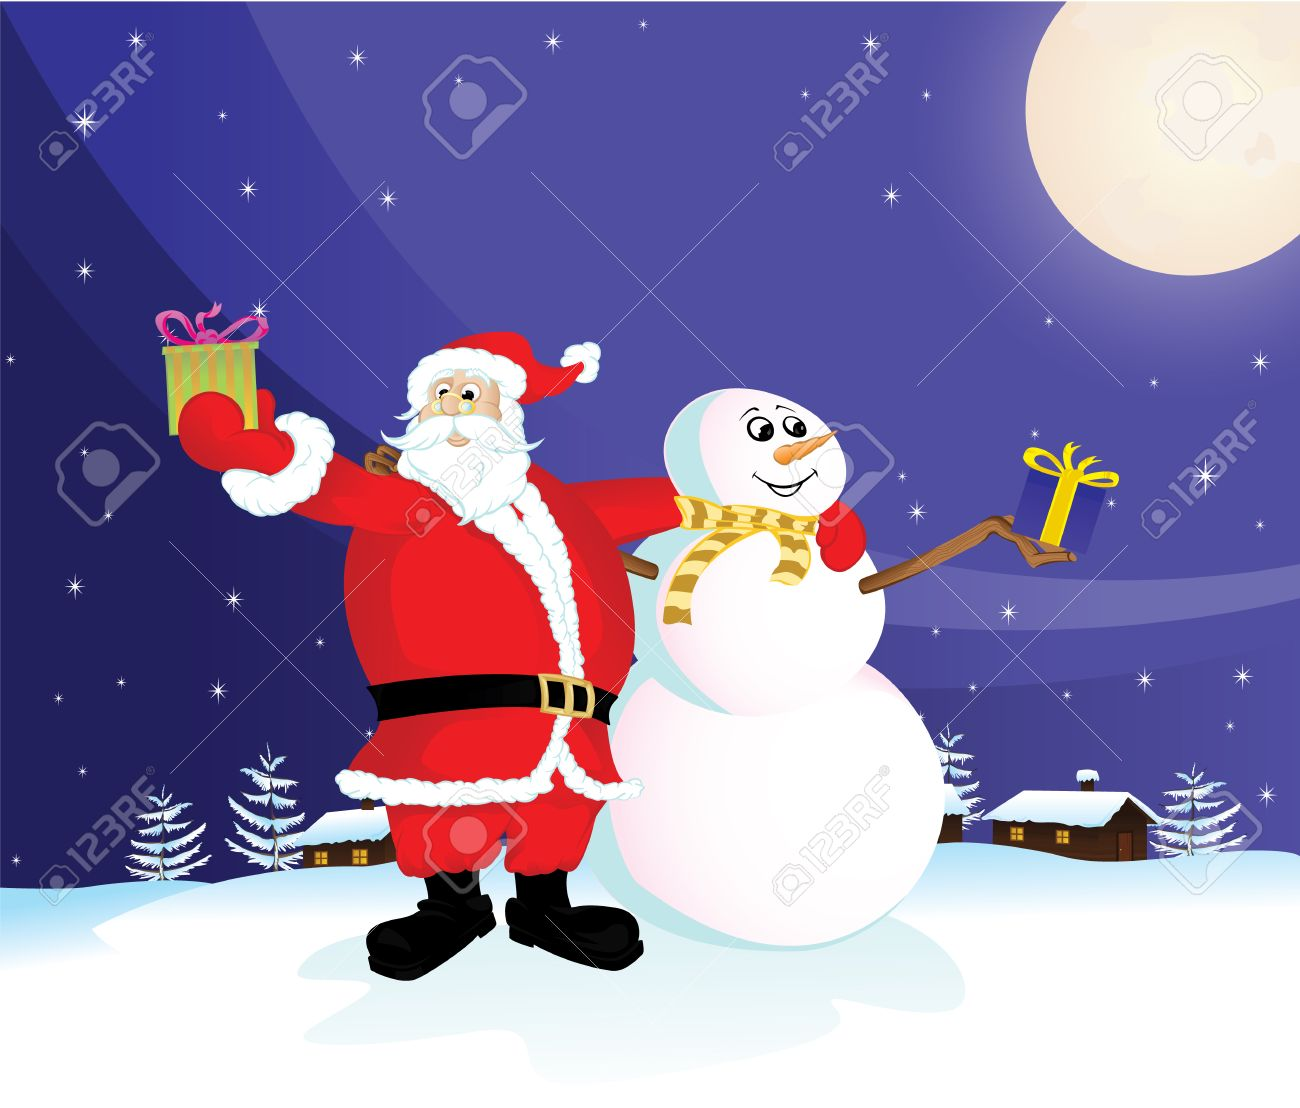 Claus Snowman Santa Claus And Snowman With